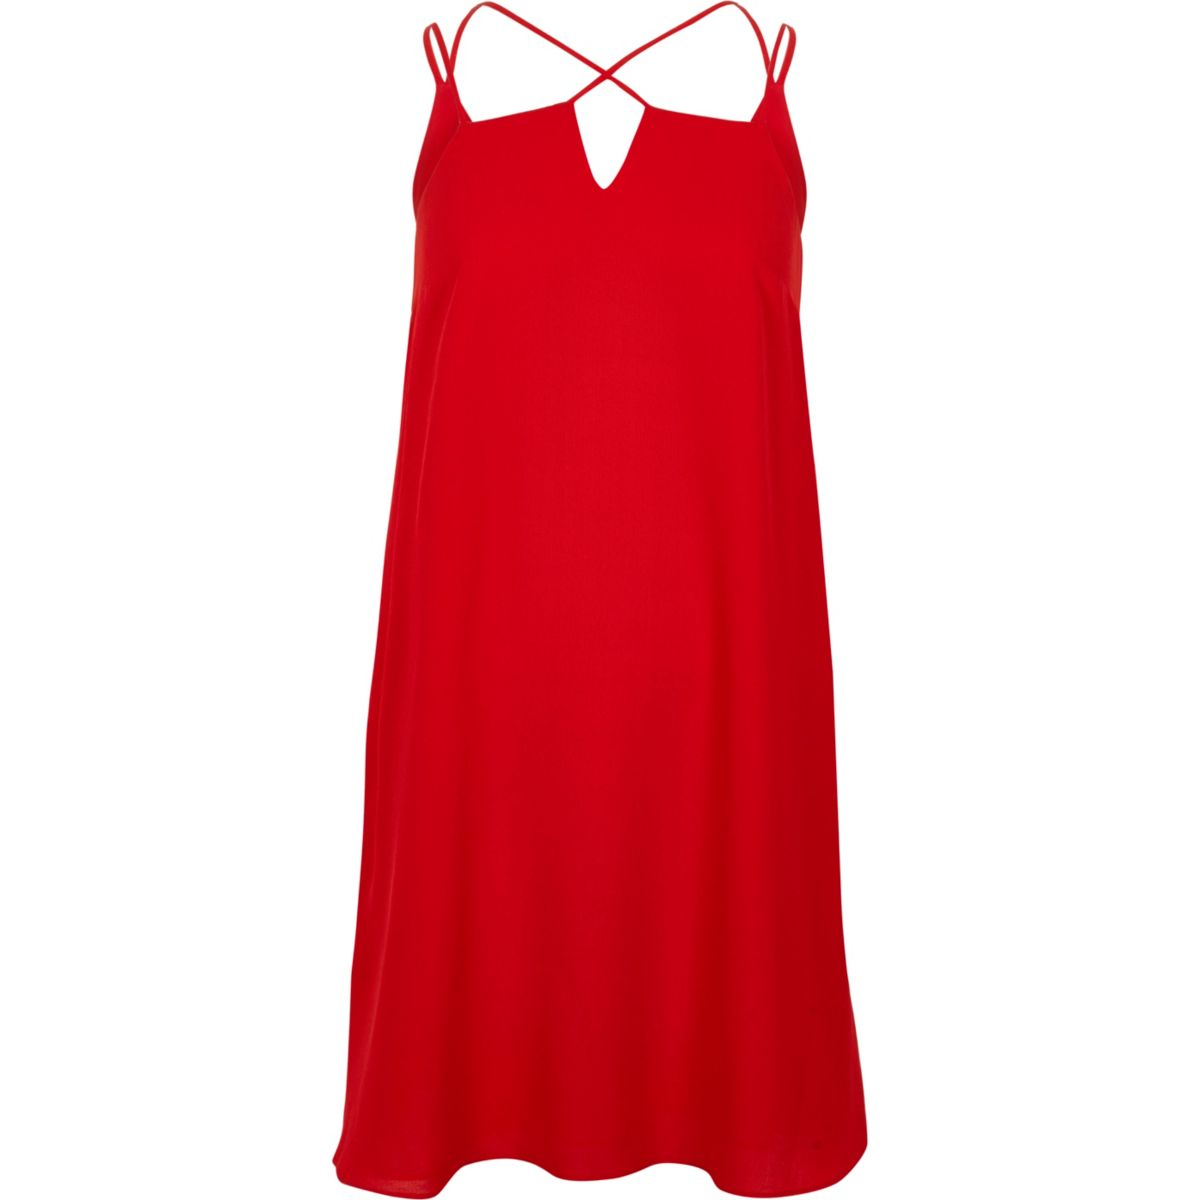 Red cross strap slip dress